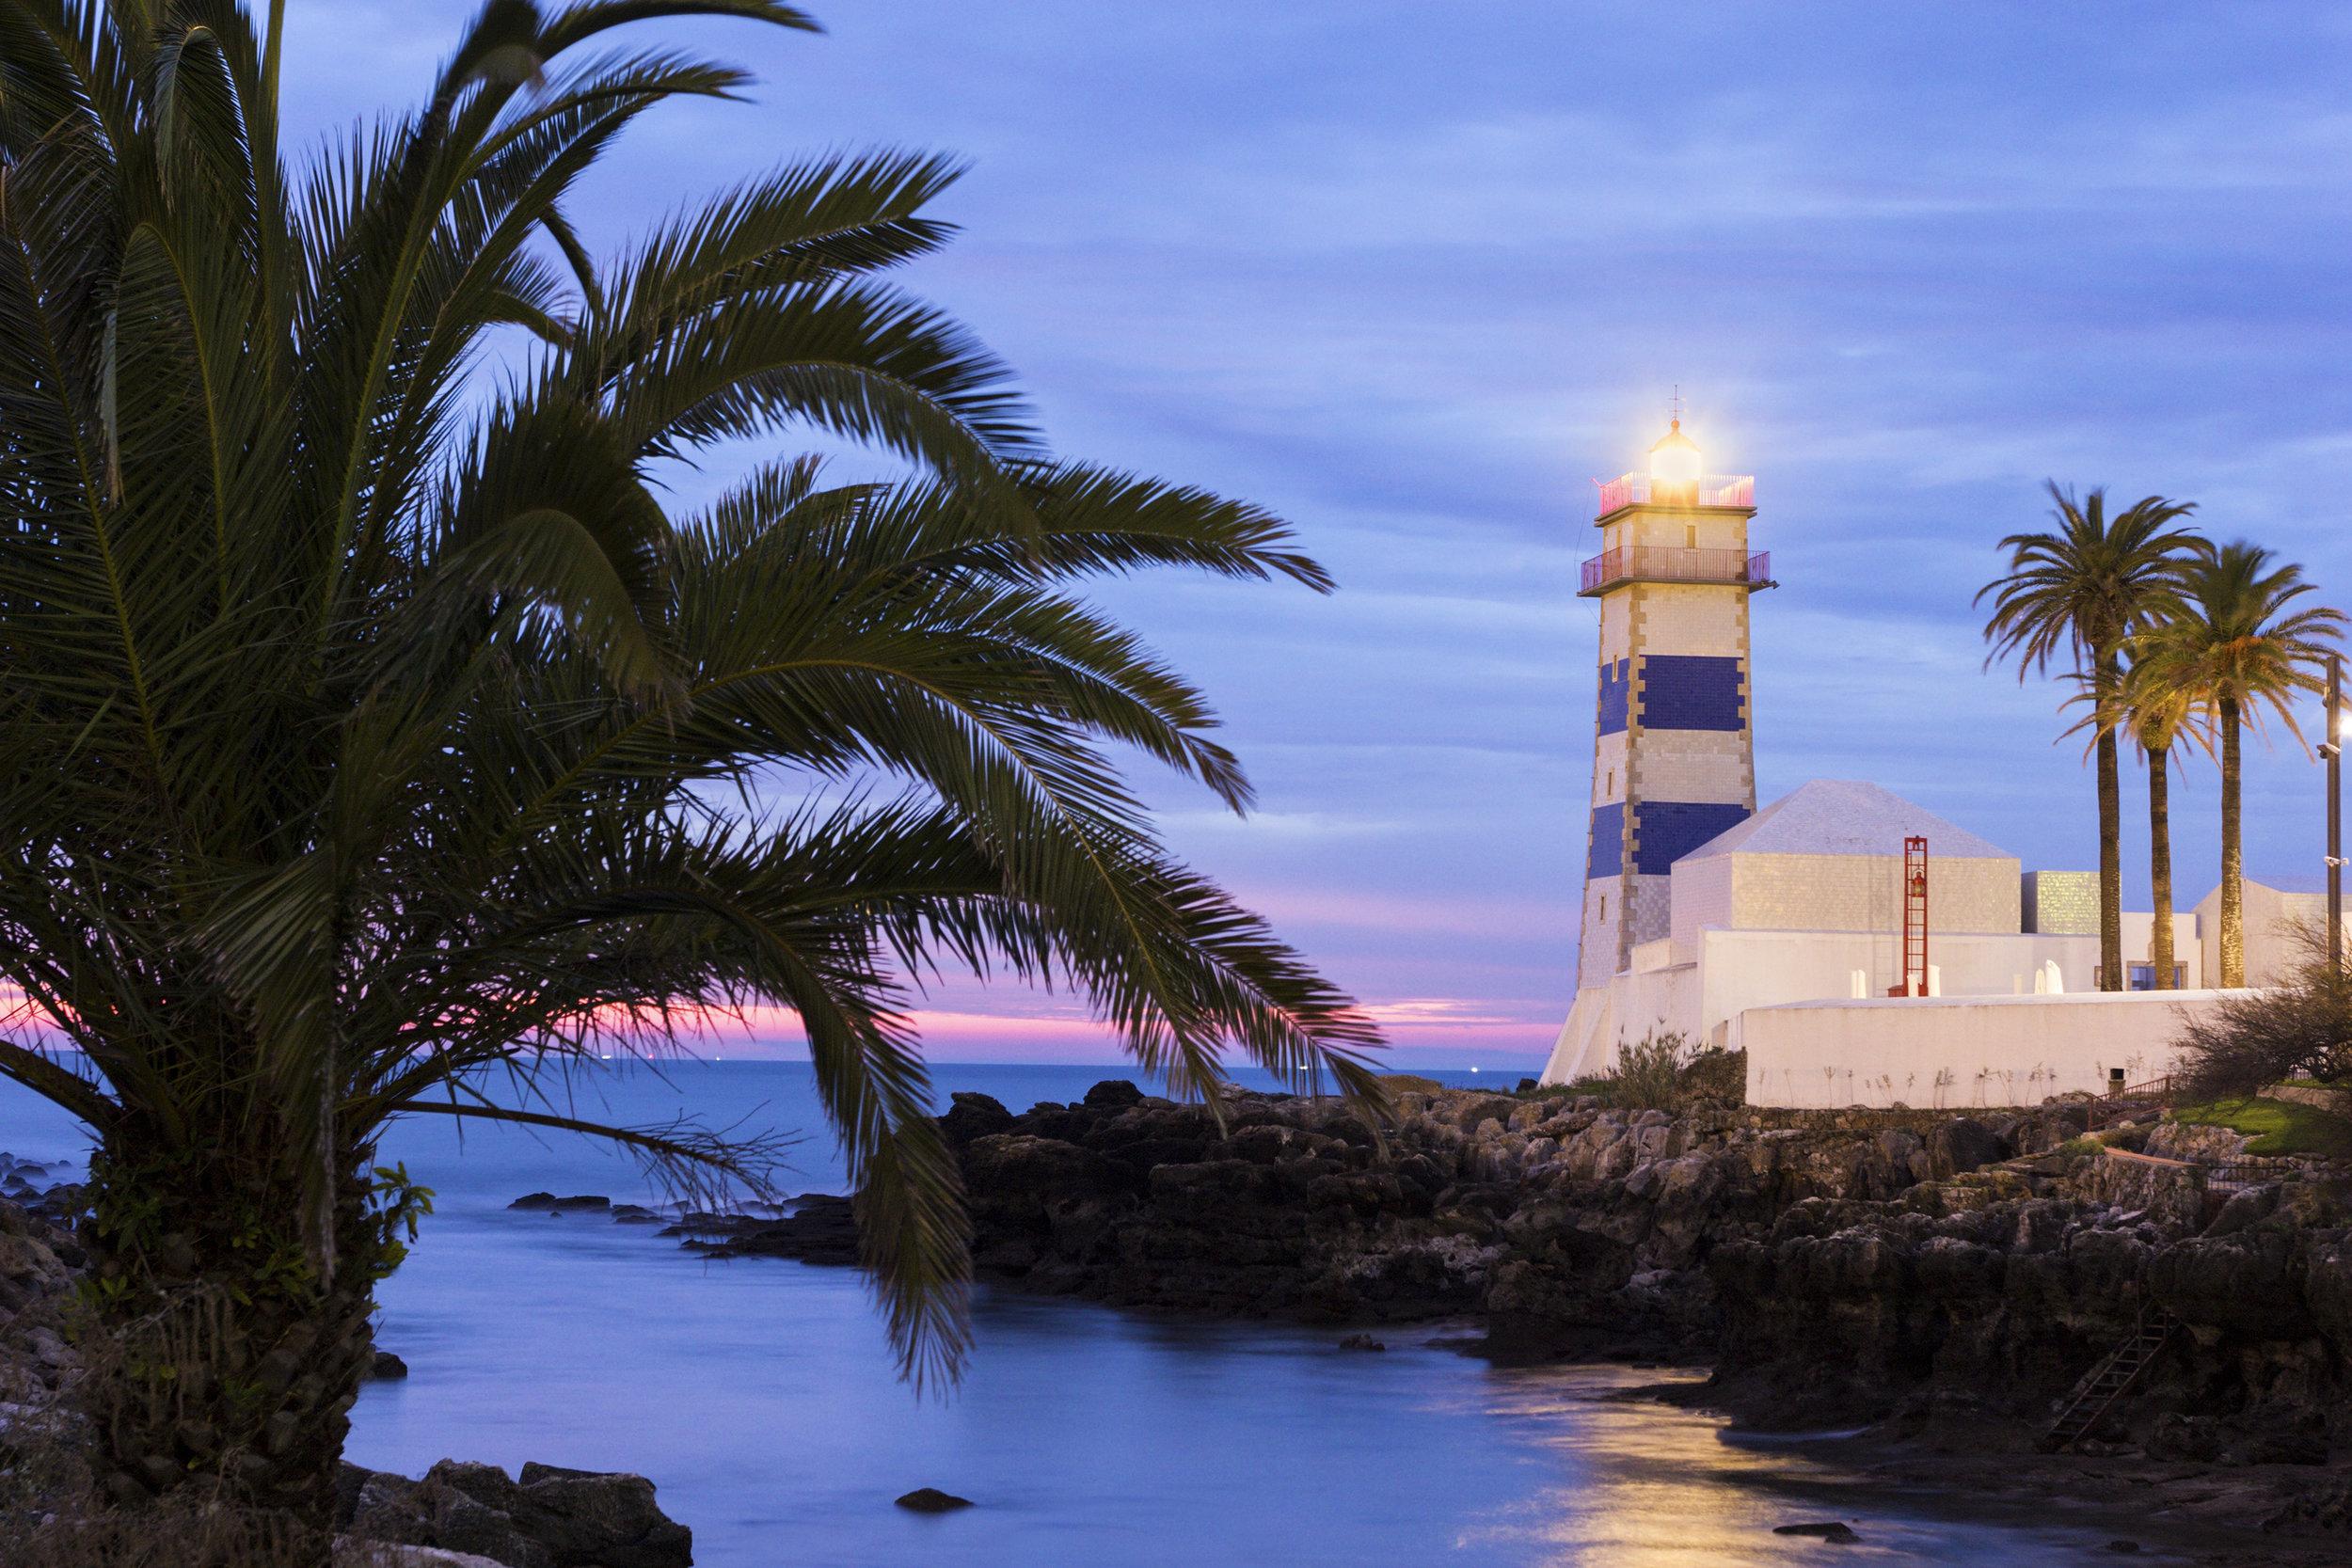 portugal_cascais_bigstock-Santa-Maria-Lighthouse-In-Casc-120613067.jpg